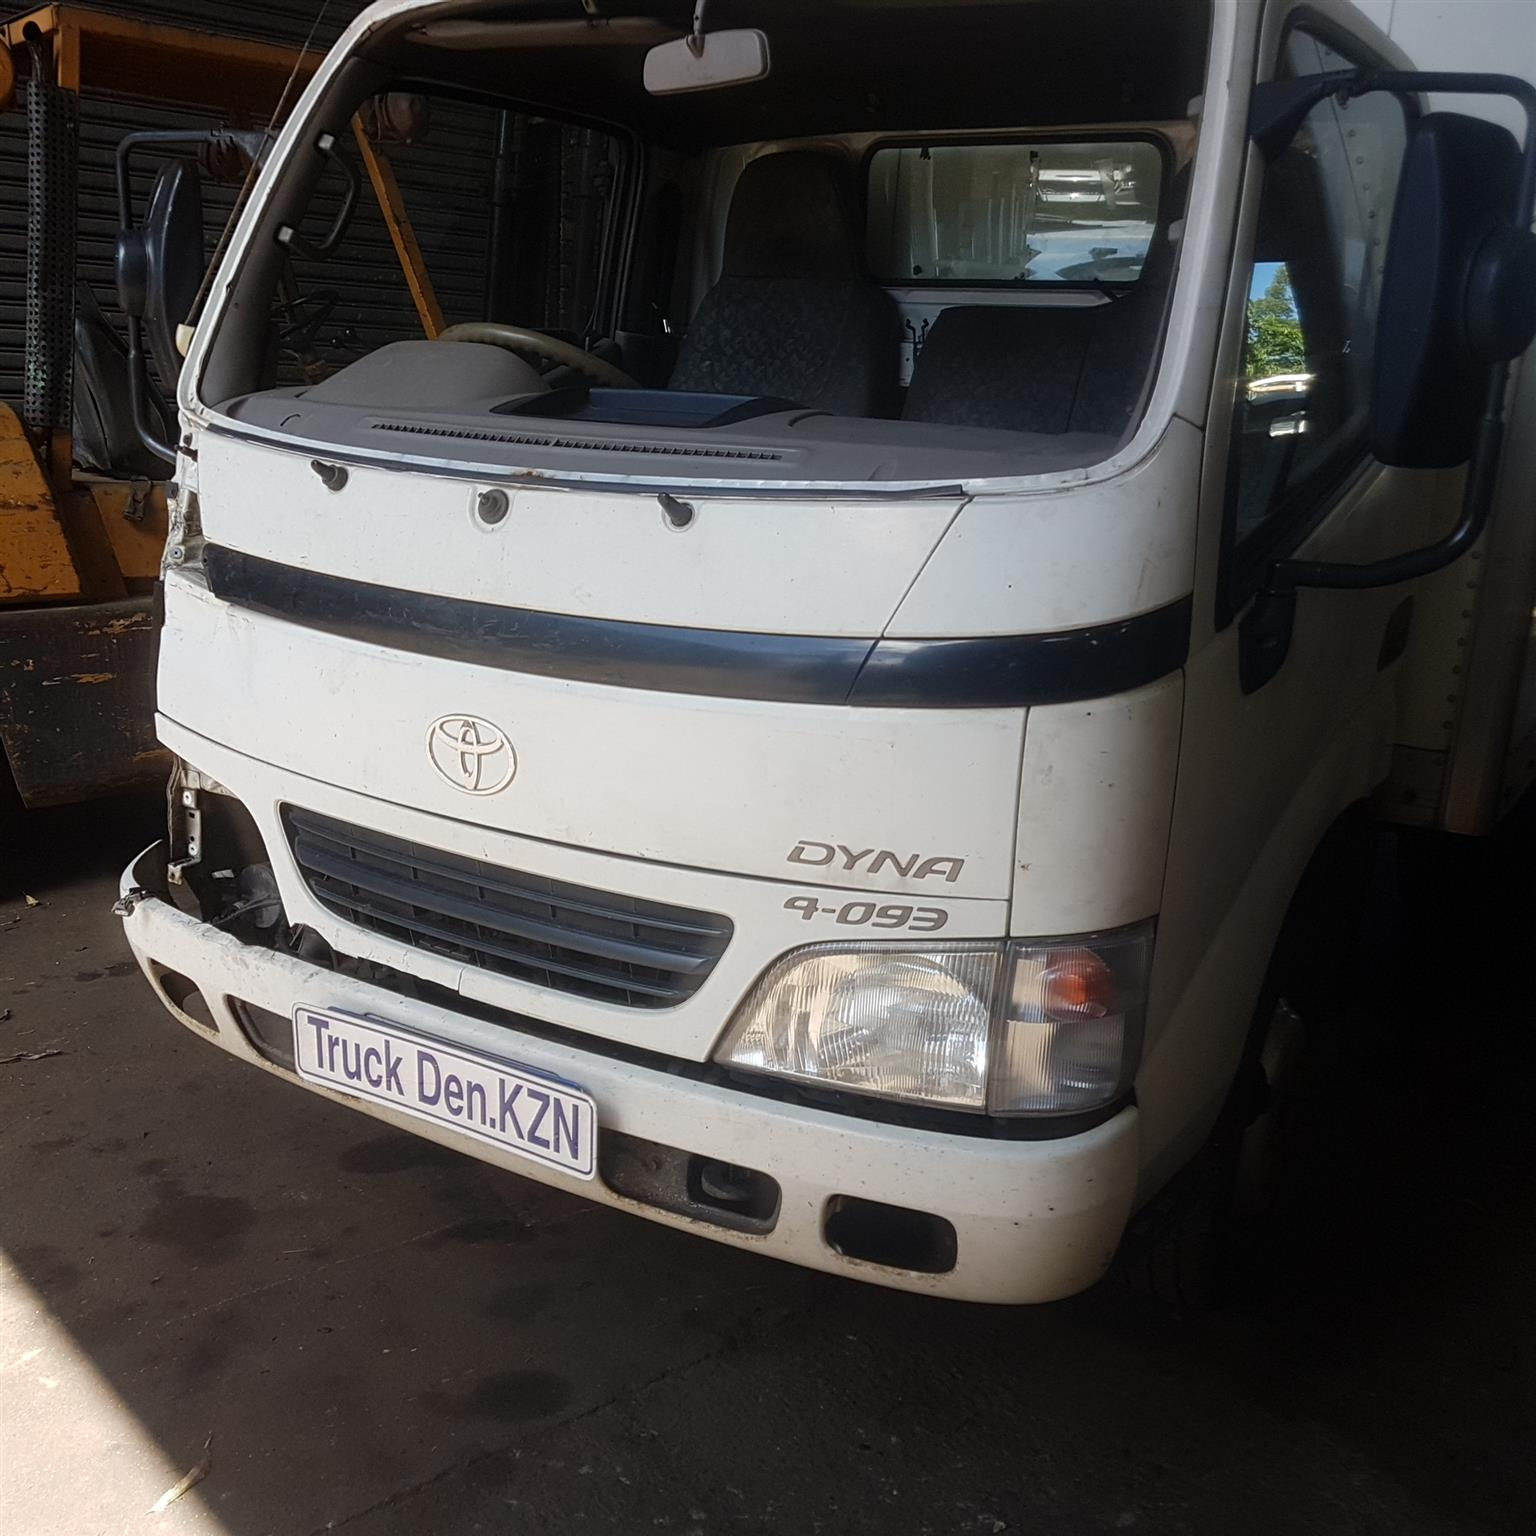 Dyna 4-093 Trucks breaking 4 spares